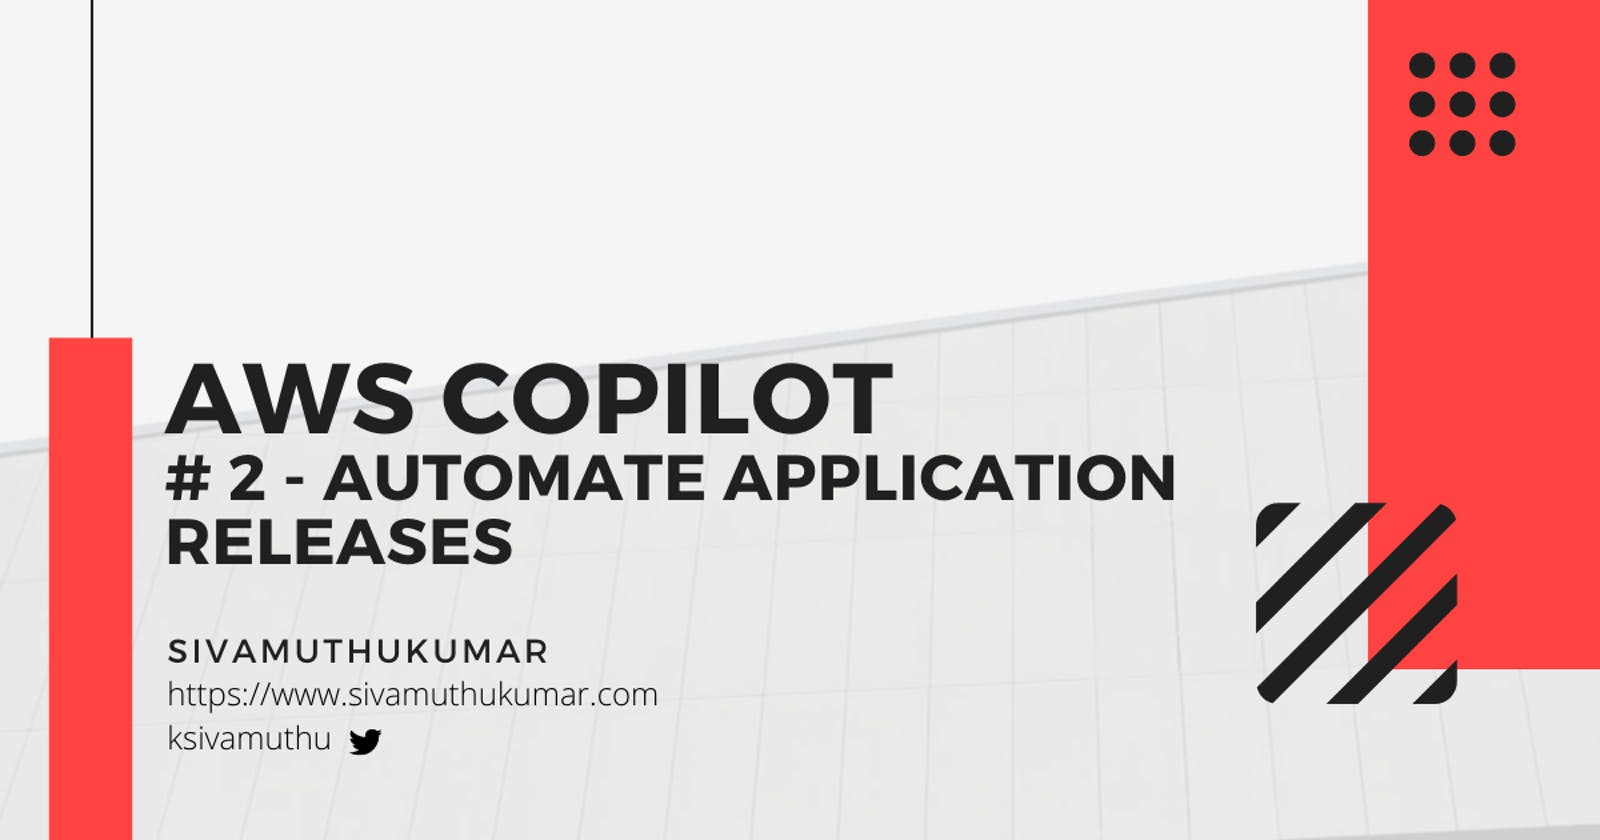 AWS Copilot - Automate Application Releases